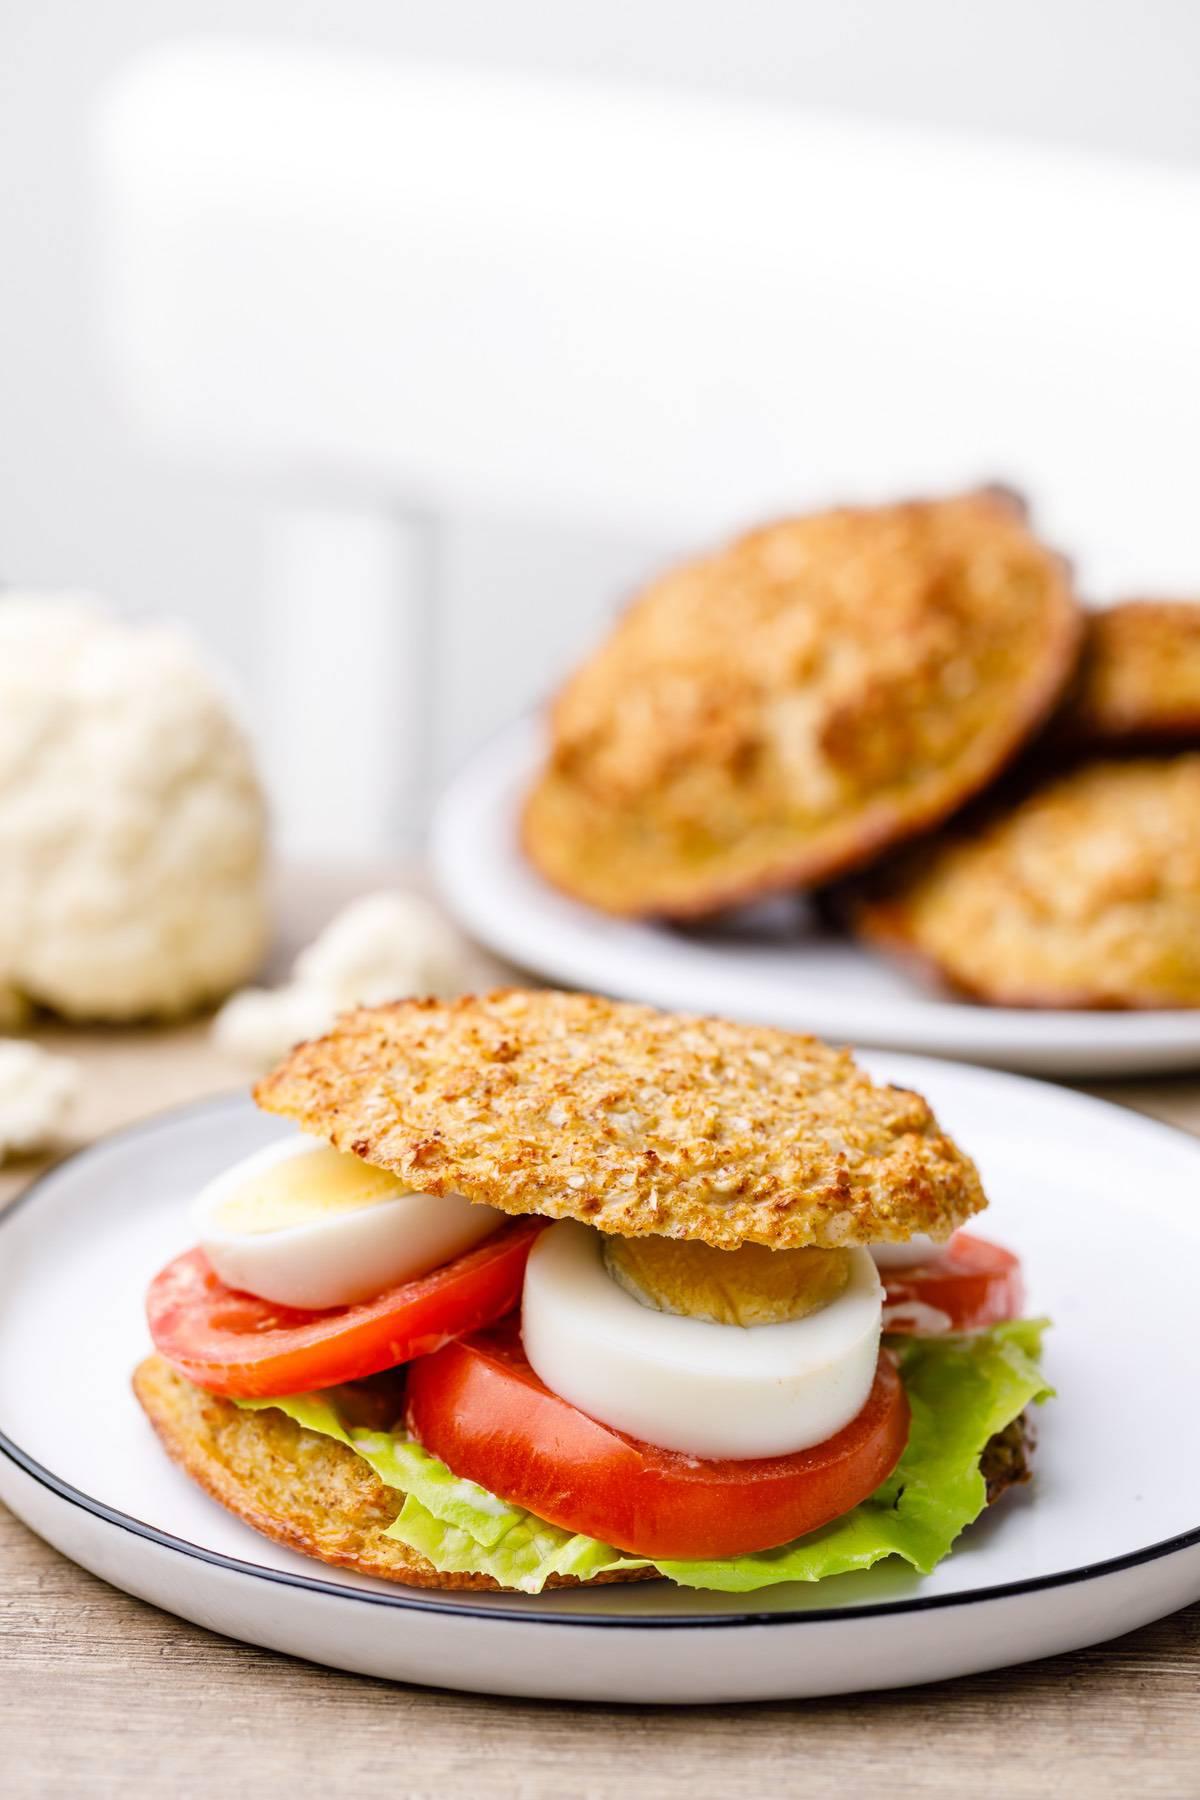 Home.fit cauliflower-bread-buns-5 Low Carb Cauliflower Bread Buns